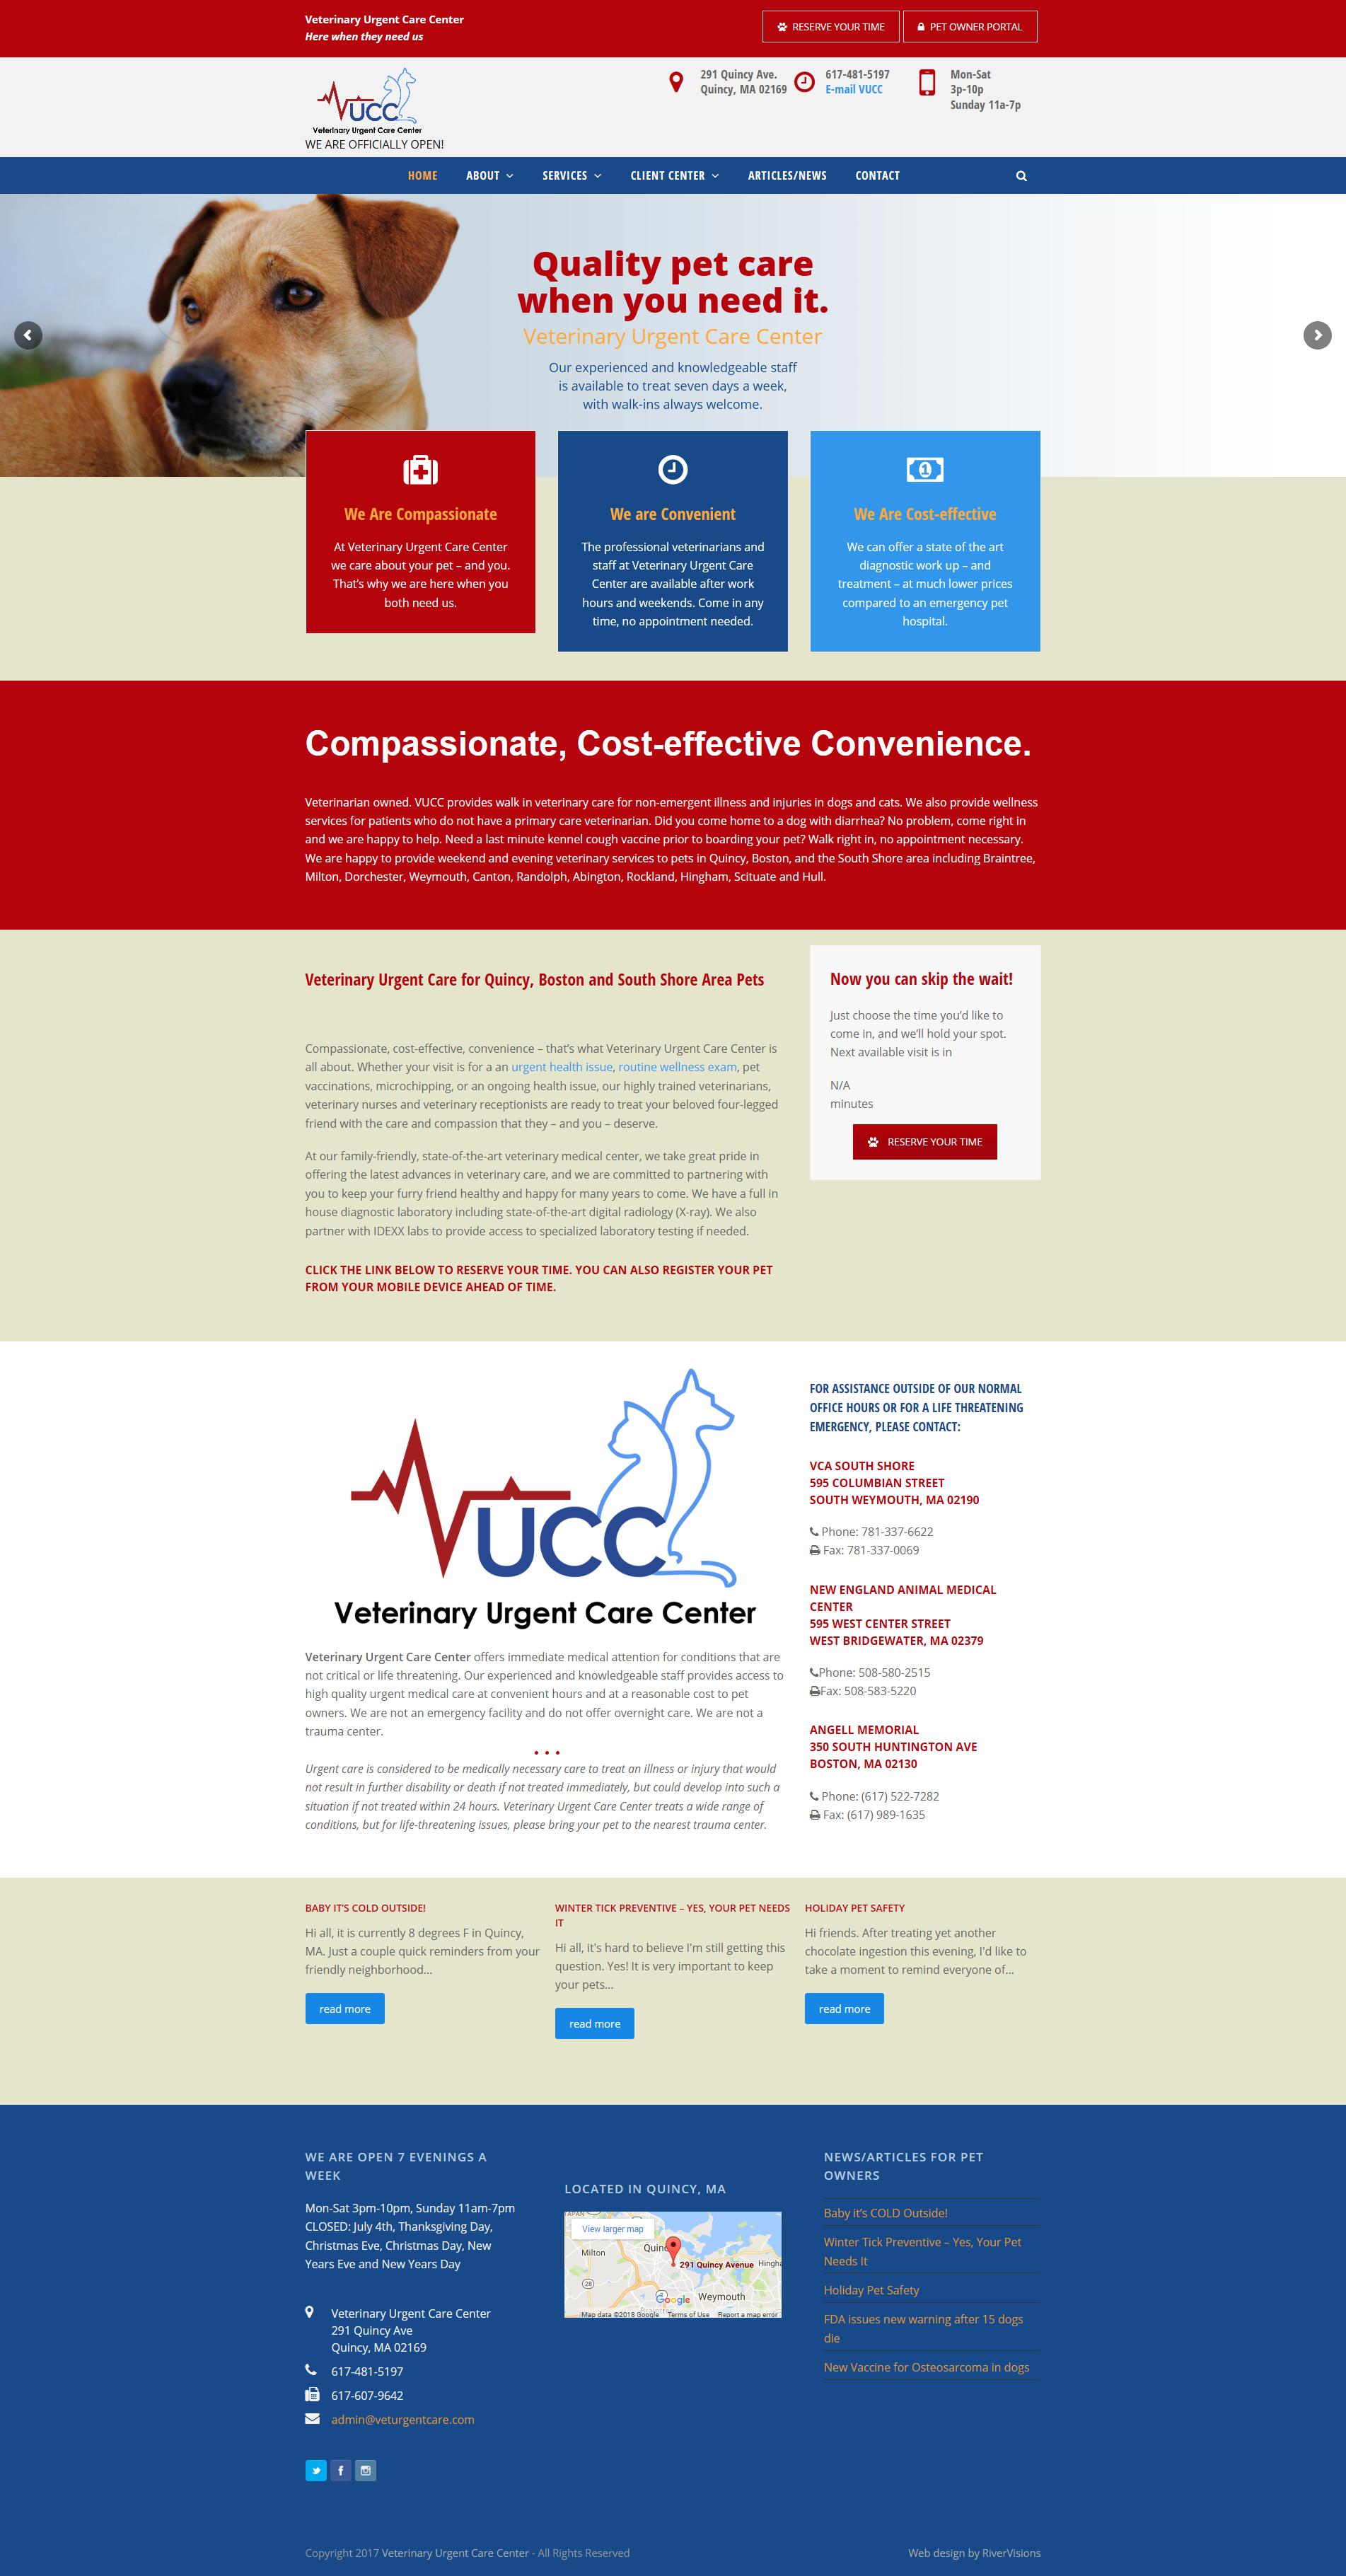 Home_-_Veterinary_Urgent_Care_Center,_Quincy_MA_-_2018-01-09_12.57.18